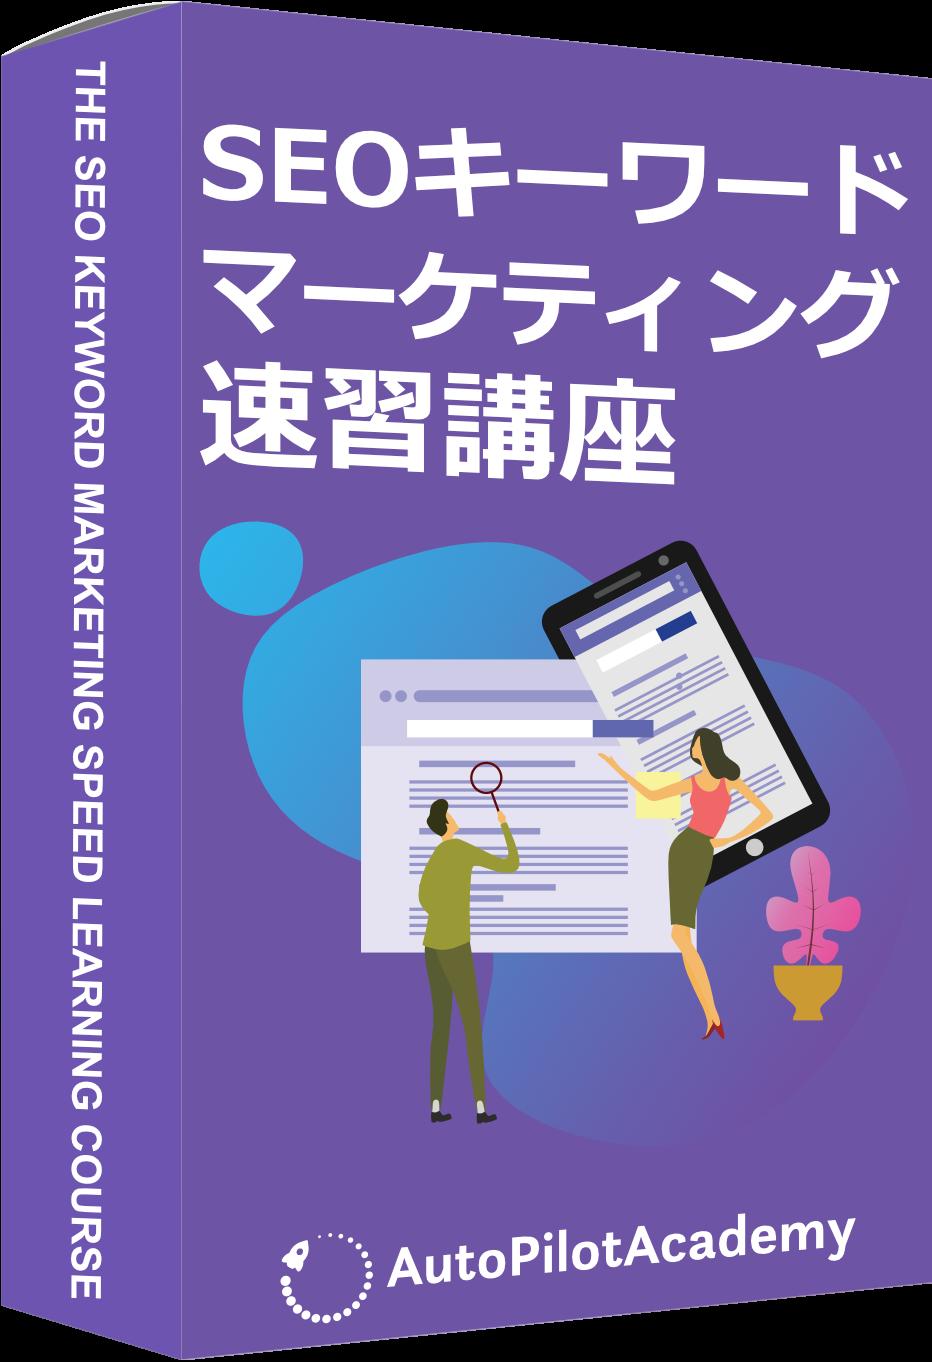 seo-keyword-marketing-speed-learning-course